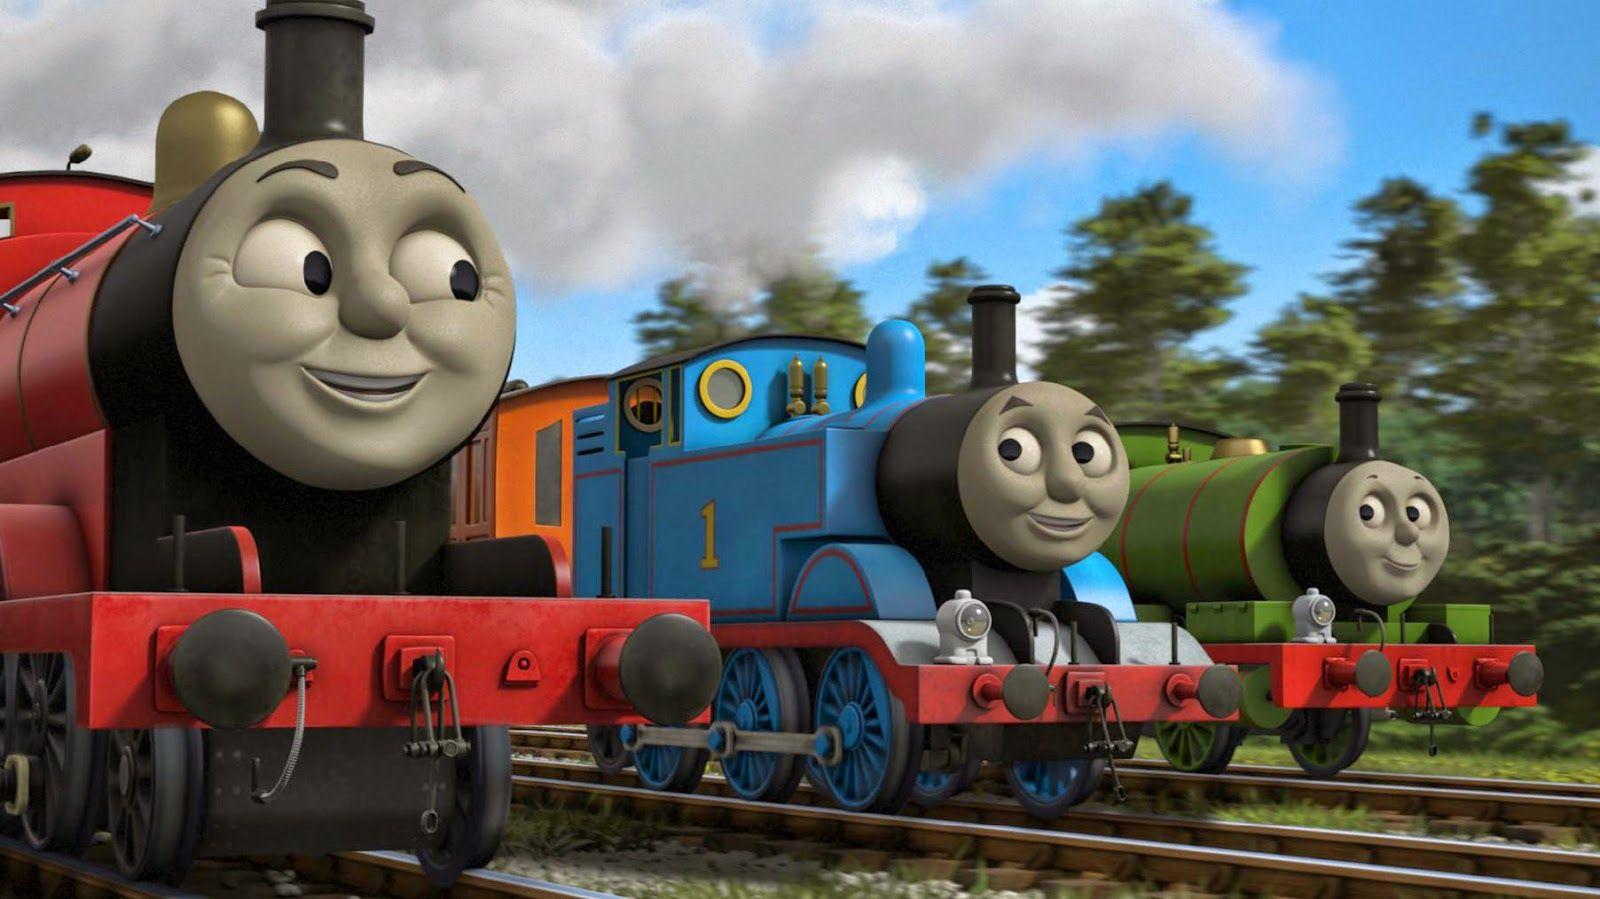 Thomas the tank engine wallpaper border - Thomas Train Wallpaper